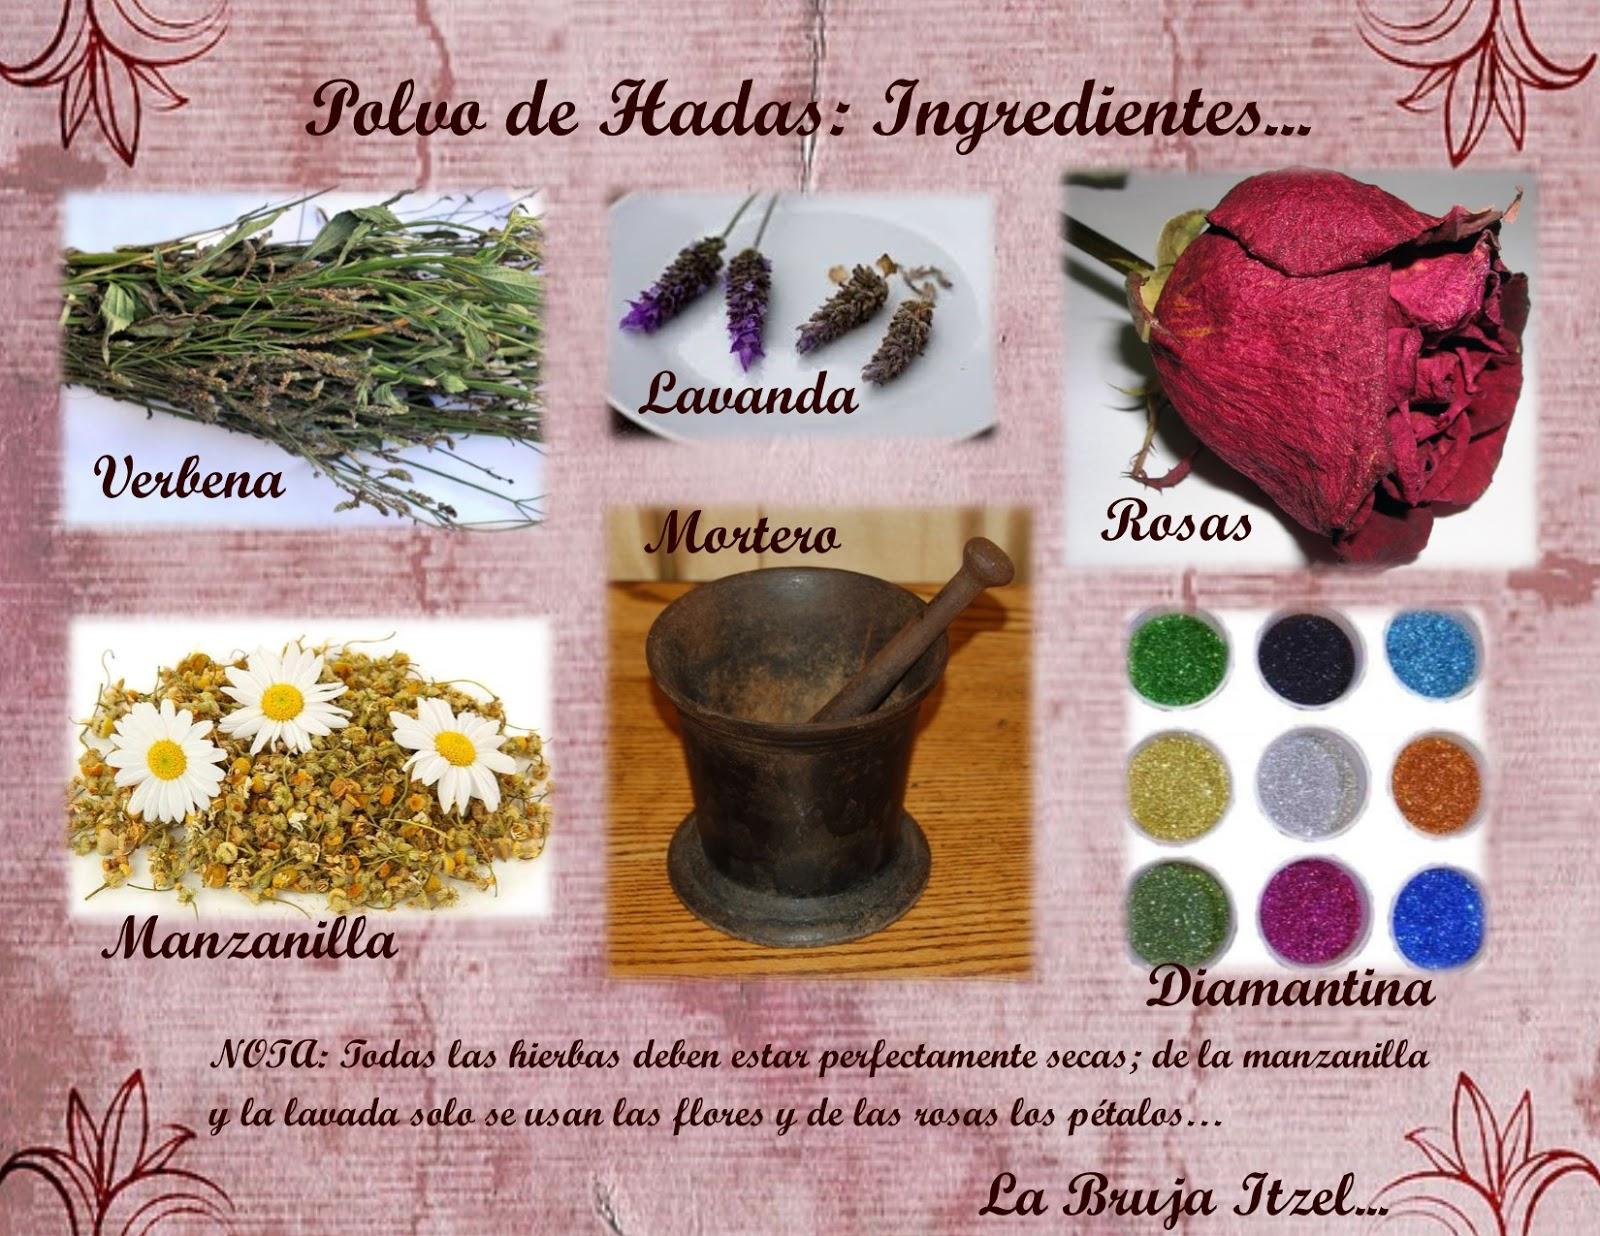 La Bruja Itzel: Polvo de Hadas...